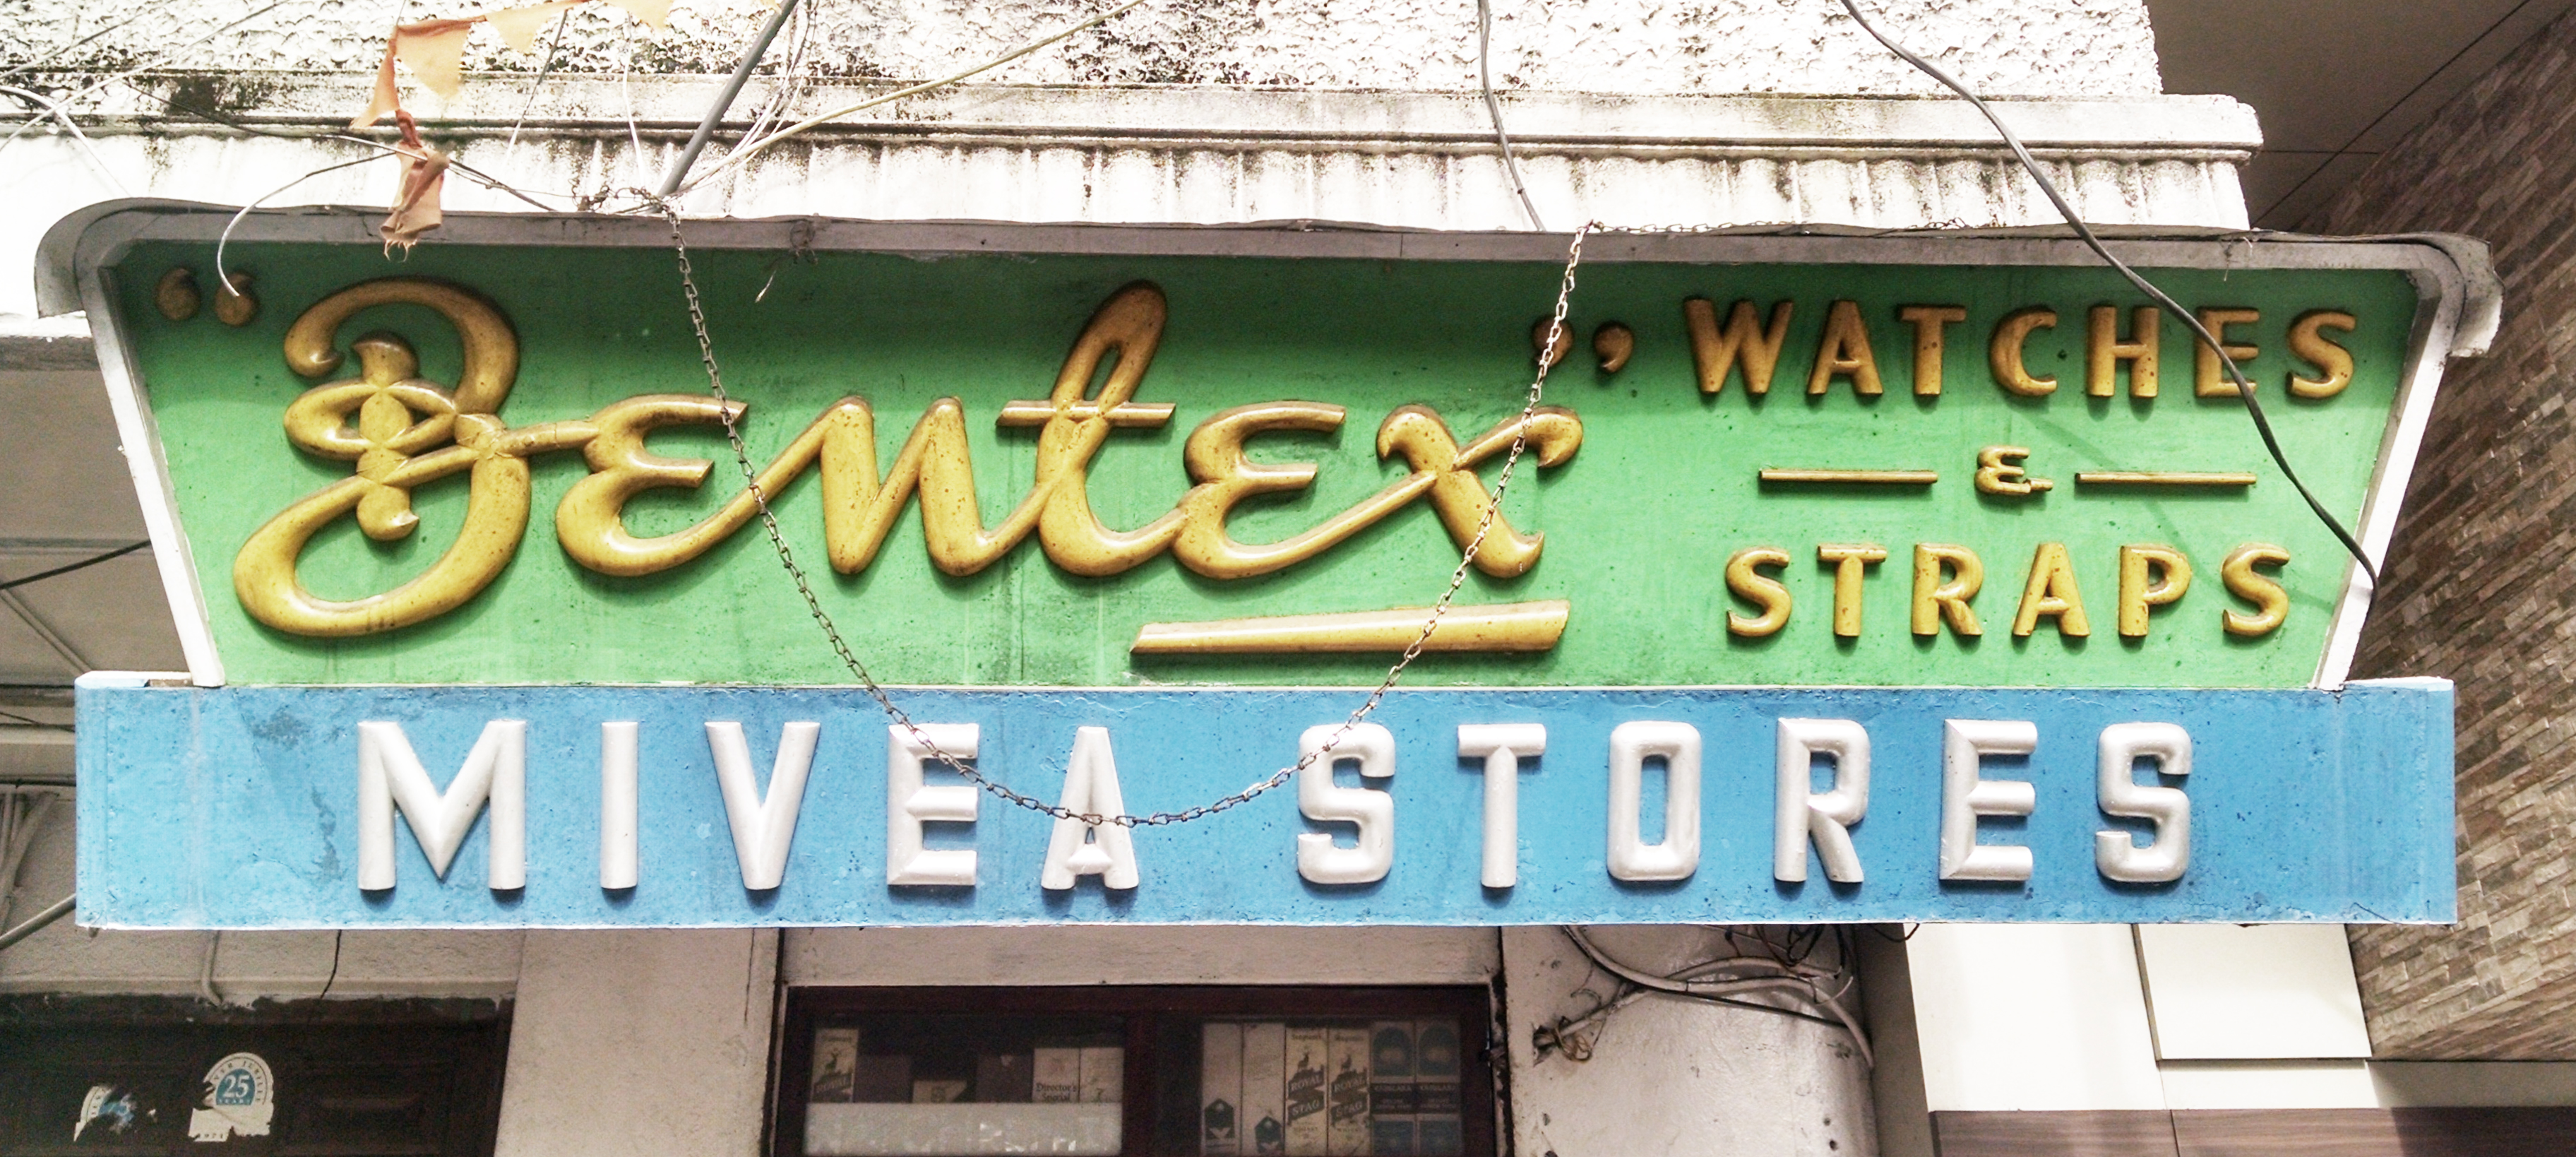 Mivea Stores